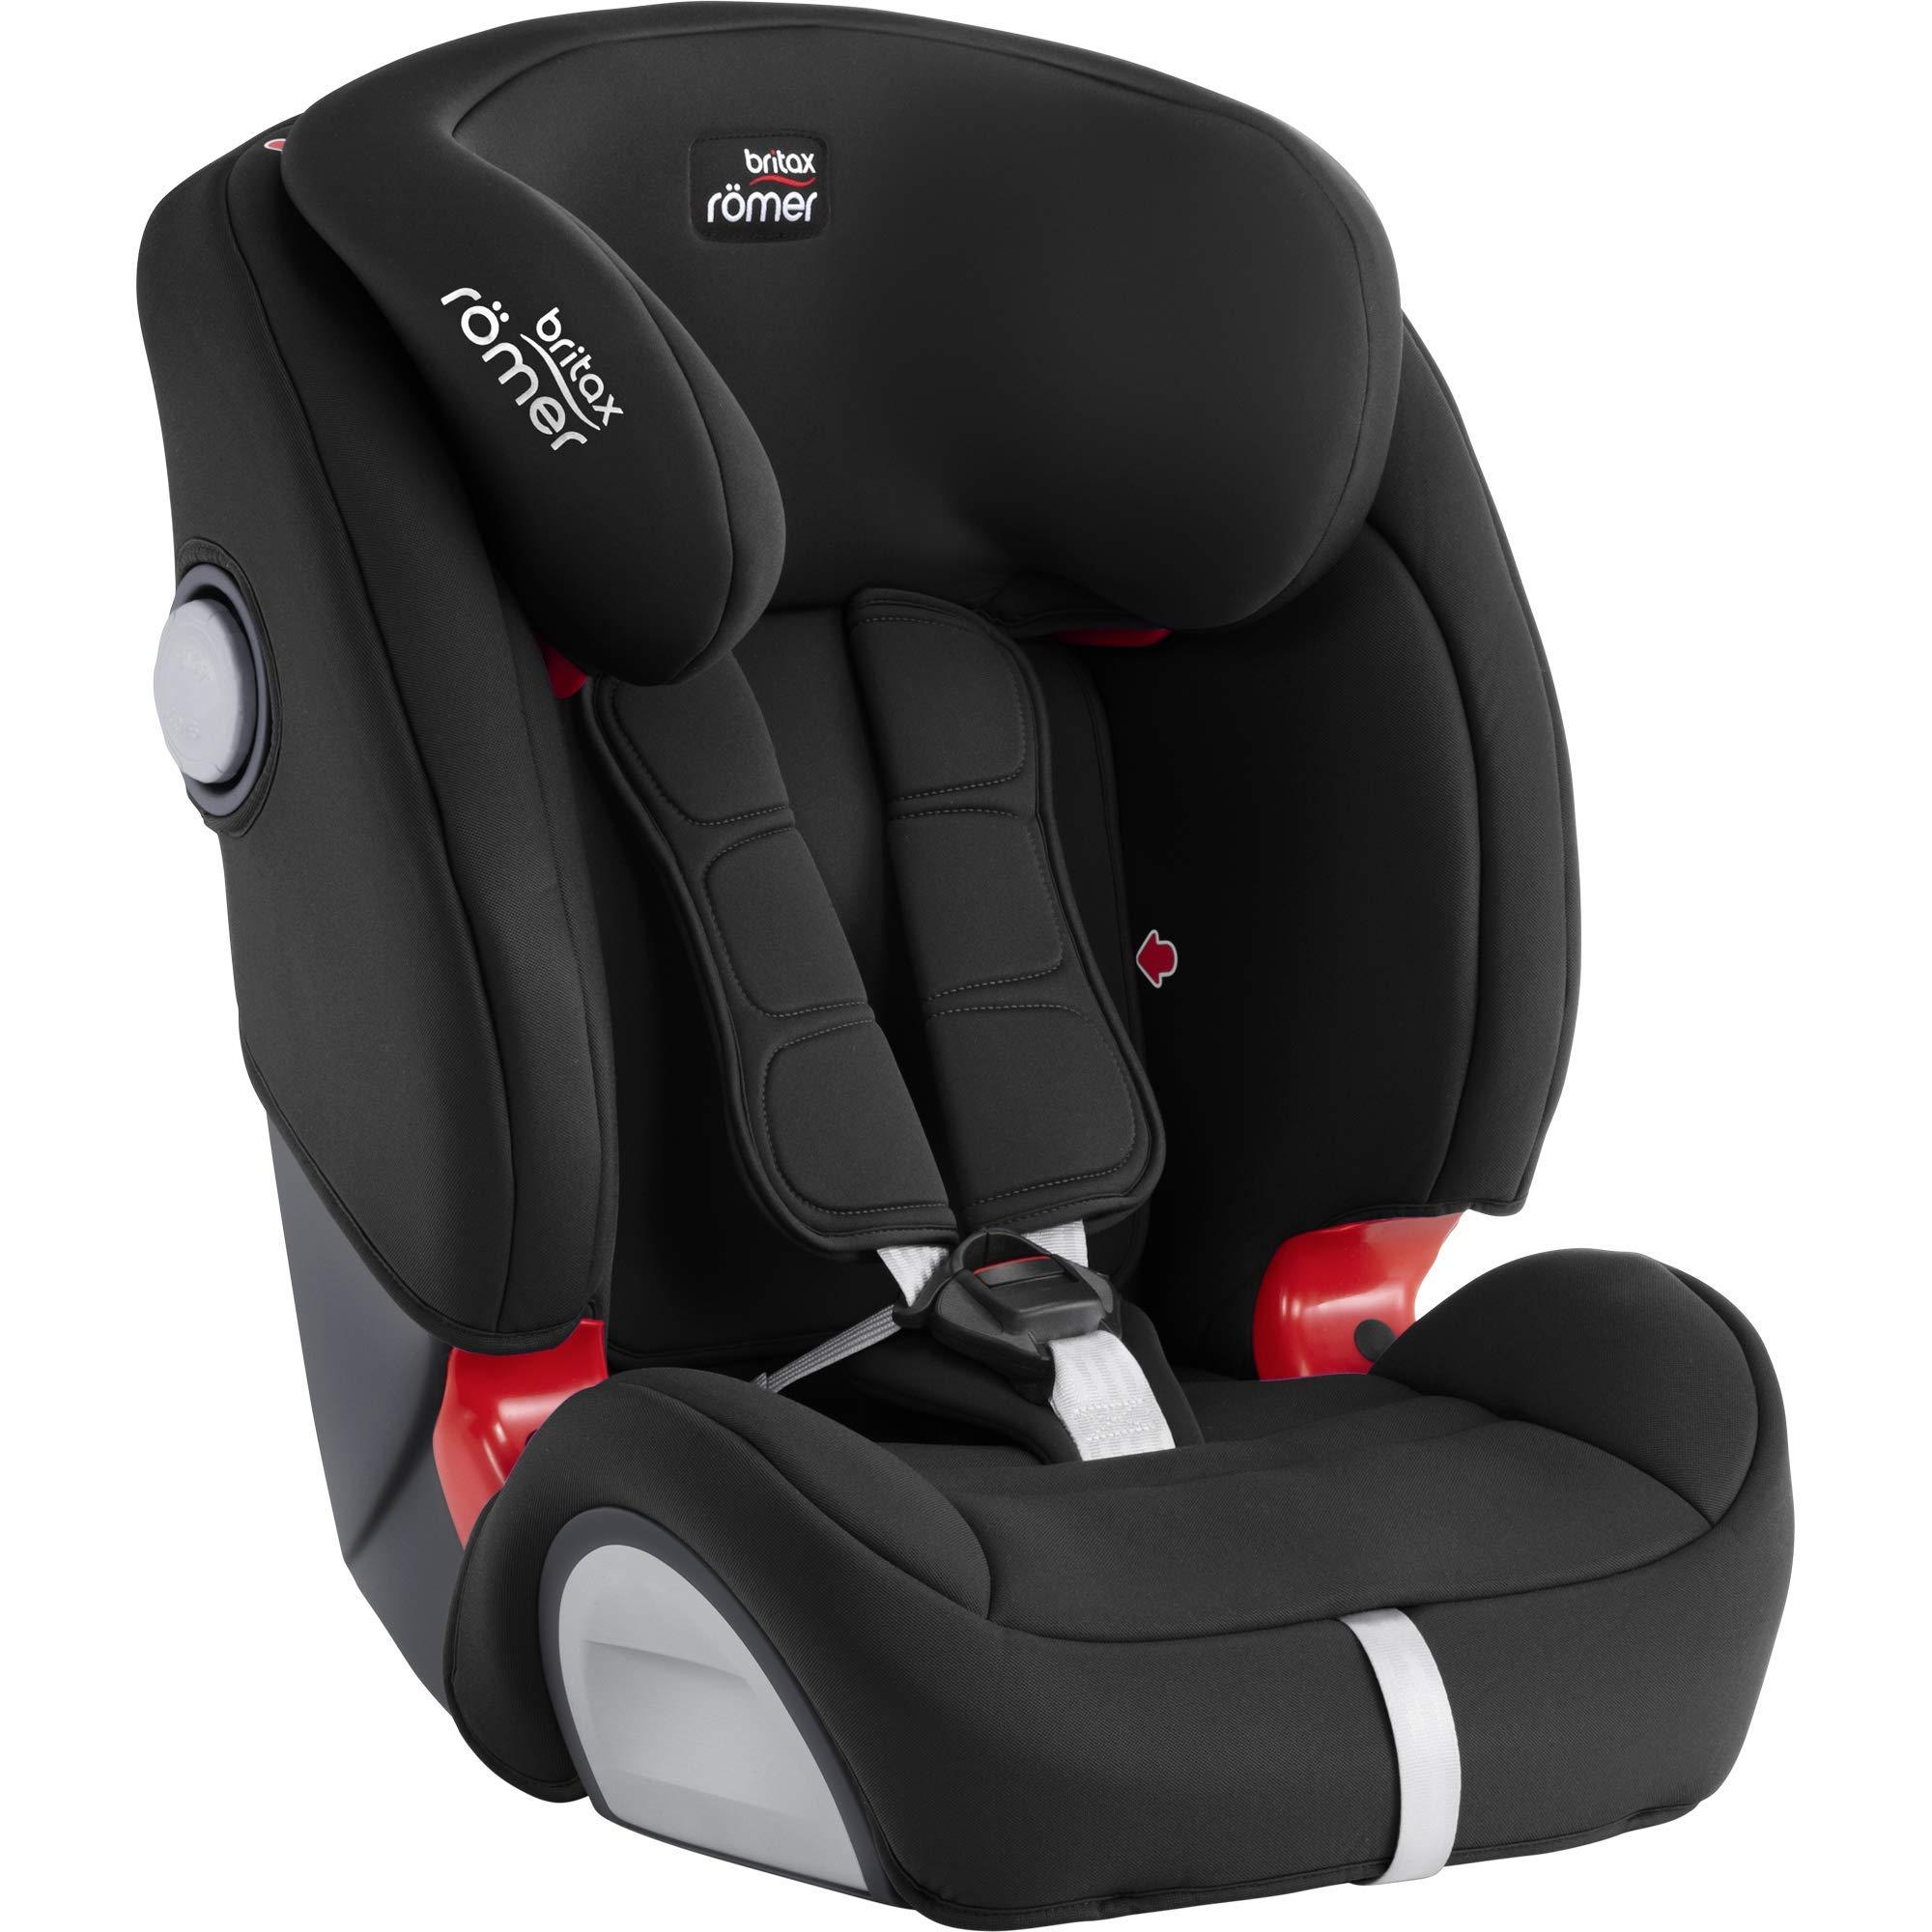 britax r mer evolva 1 2 3 sl sict group 1 2 3 9 36kg car seat driving in france all you. Black Bedroom Furniture Sets. Home Design Ideas